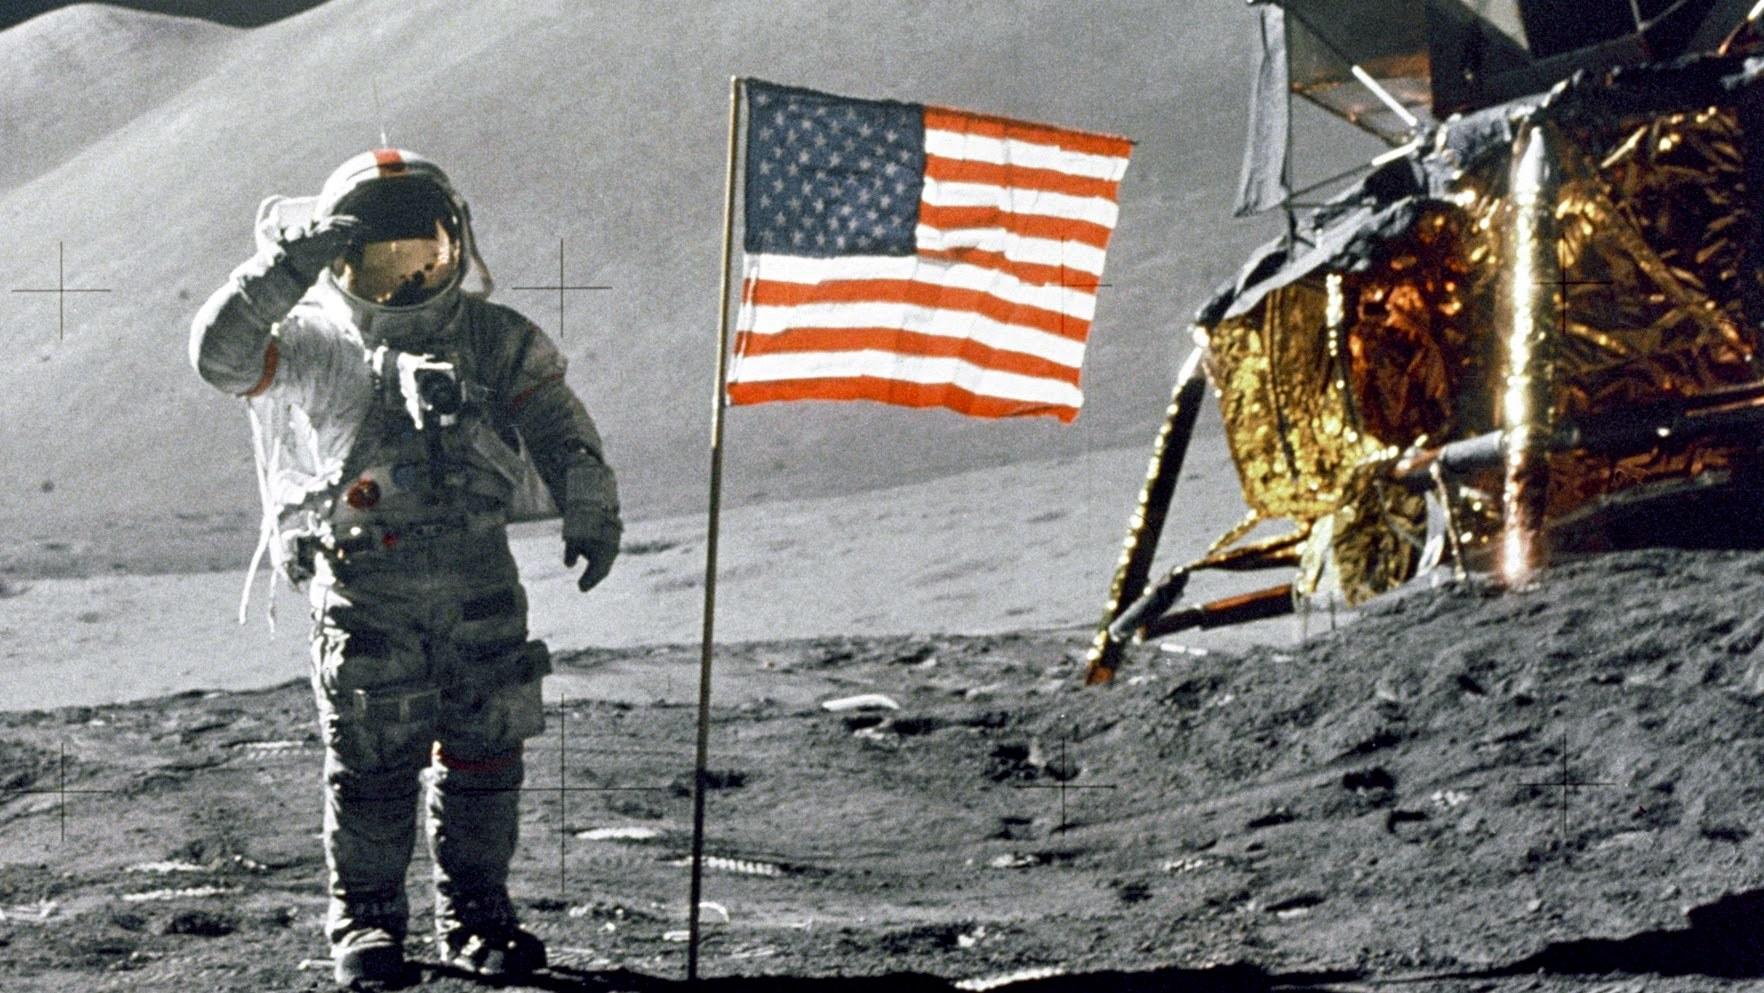 Caption: Neil Armstrong, Credit: NASA